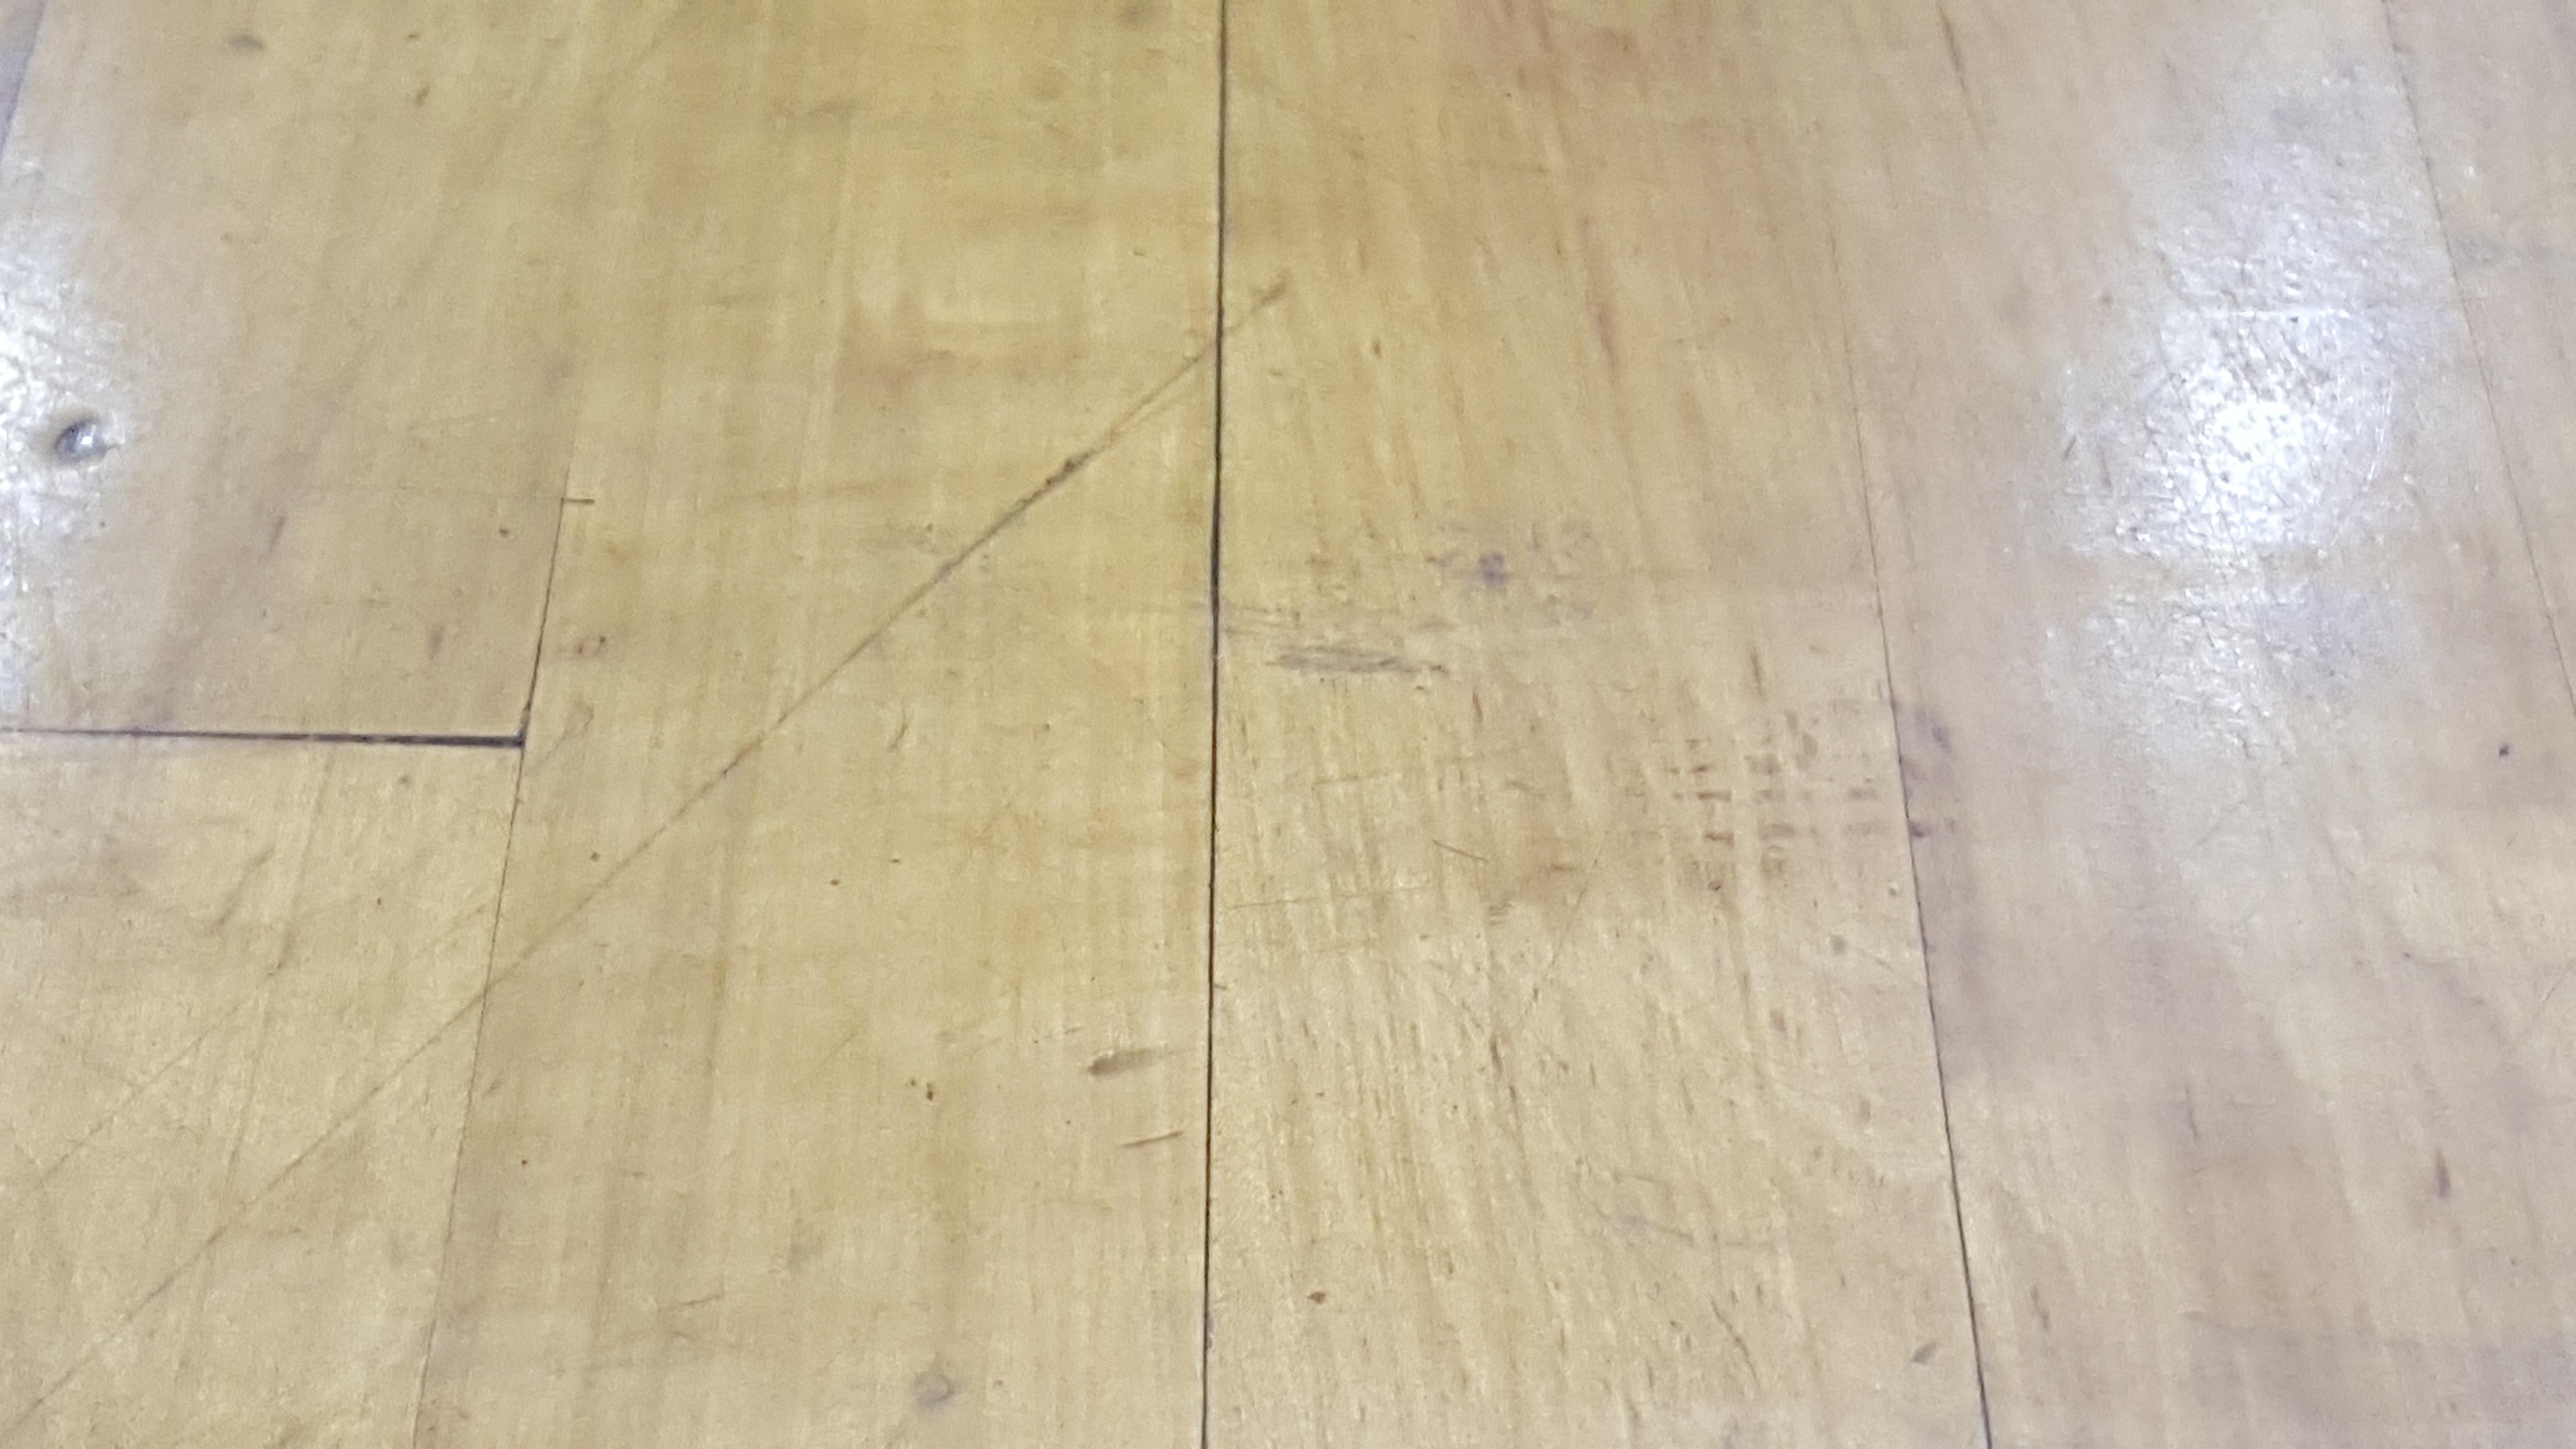 Gratis stockfoto van basketbalveld gedeukte vloer houten vloer.